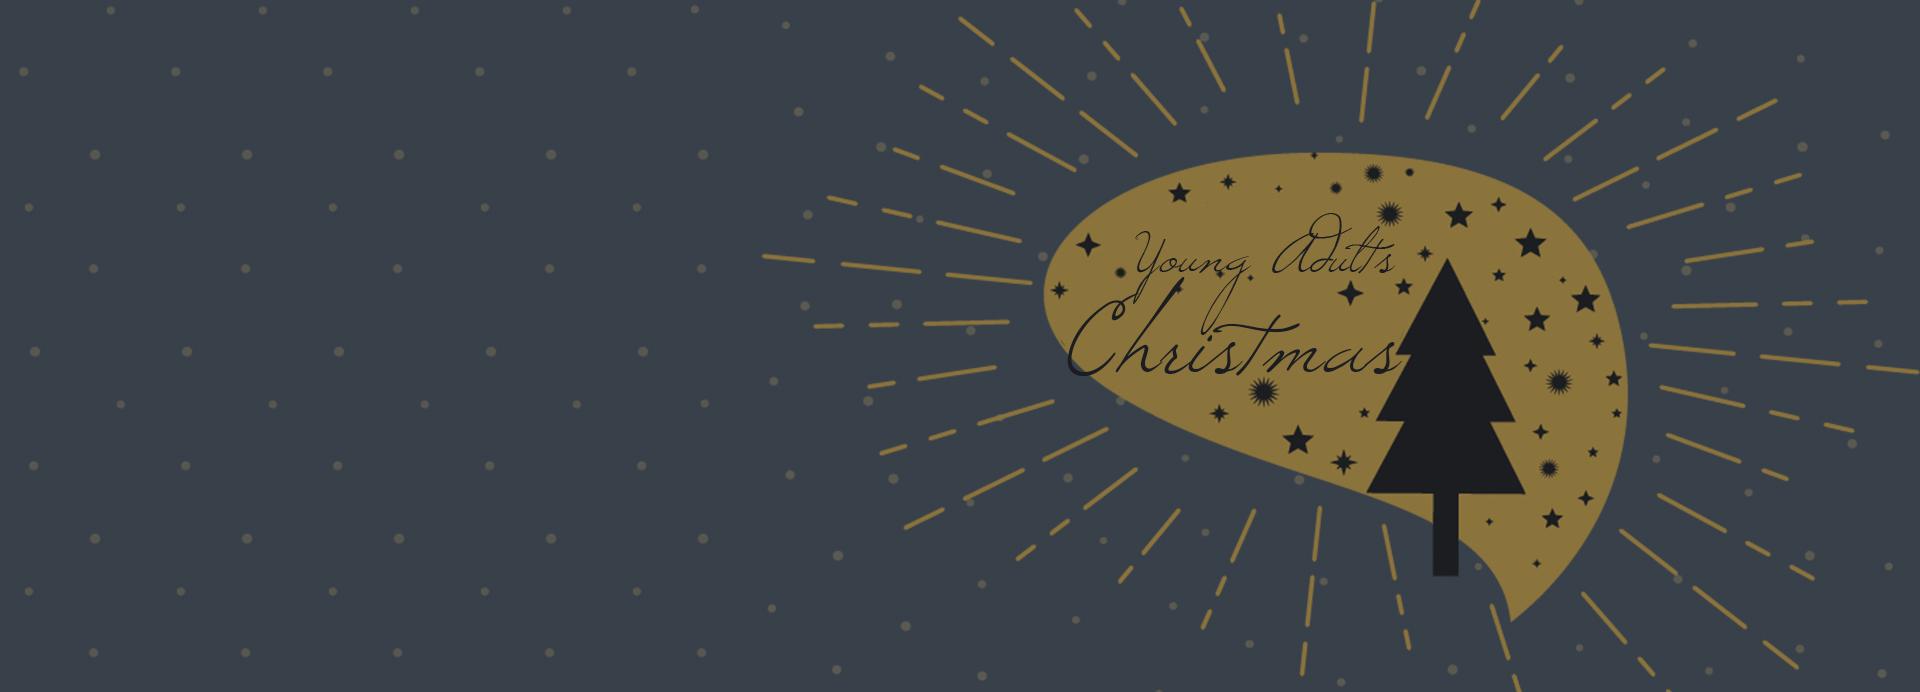 1920x692 YA Christmas.jpg